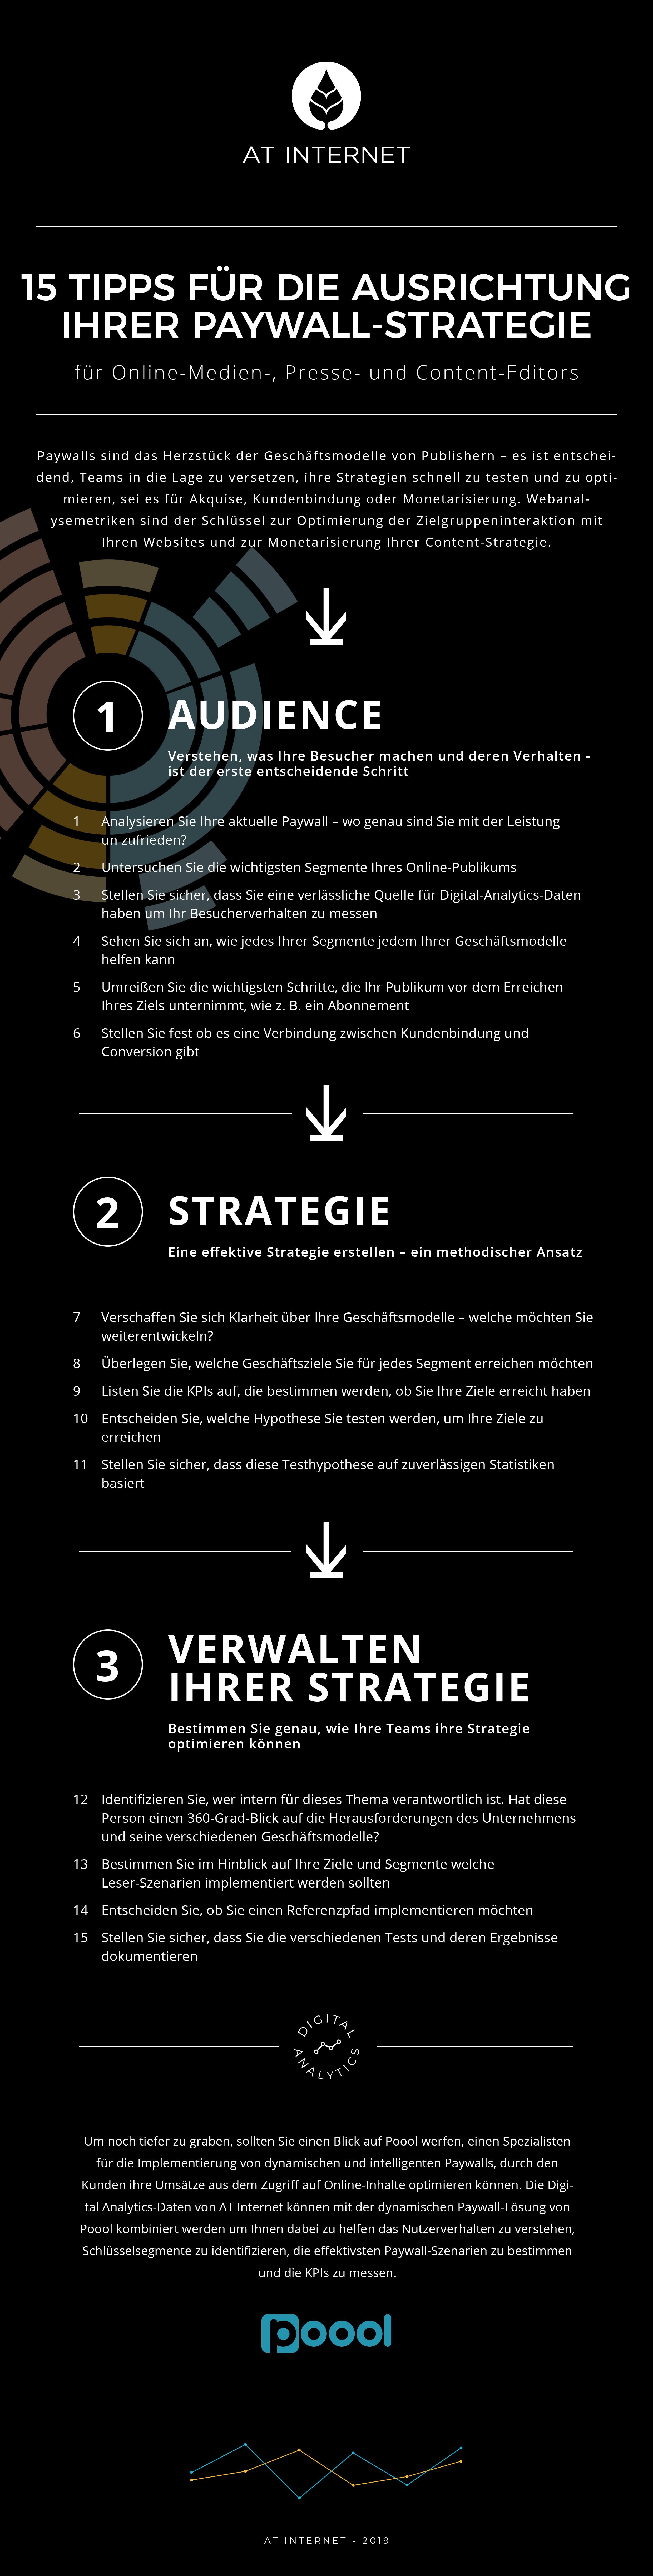 Infografik: Paywall-strategie